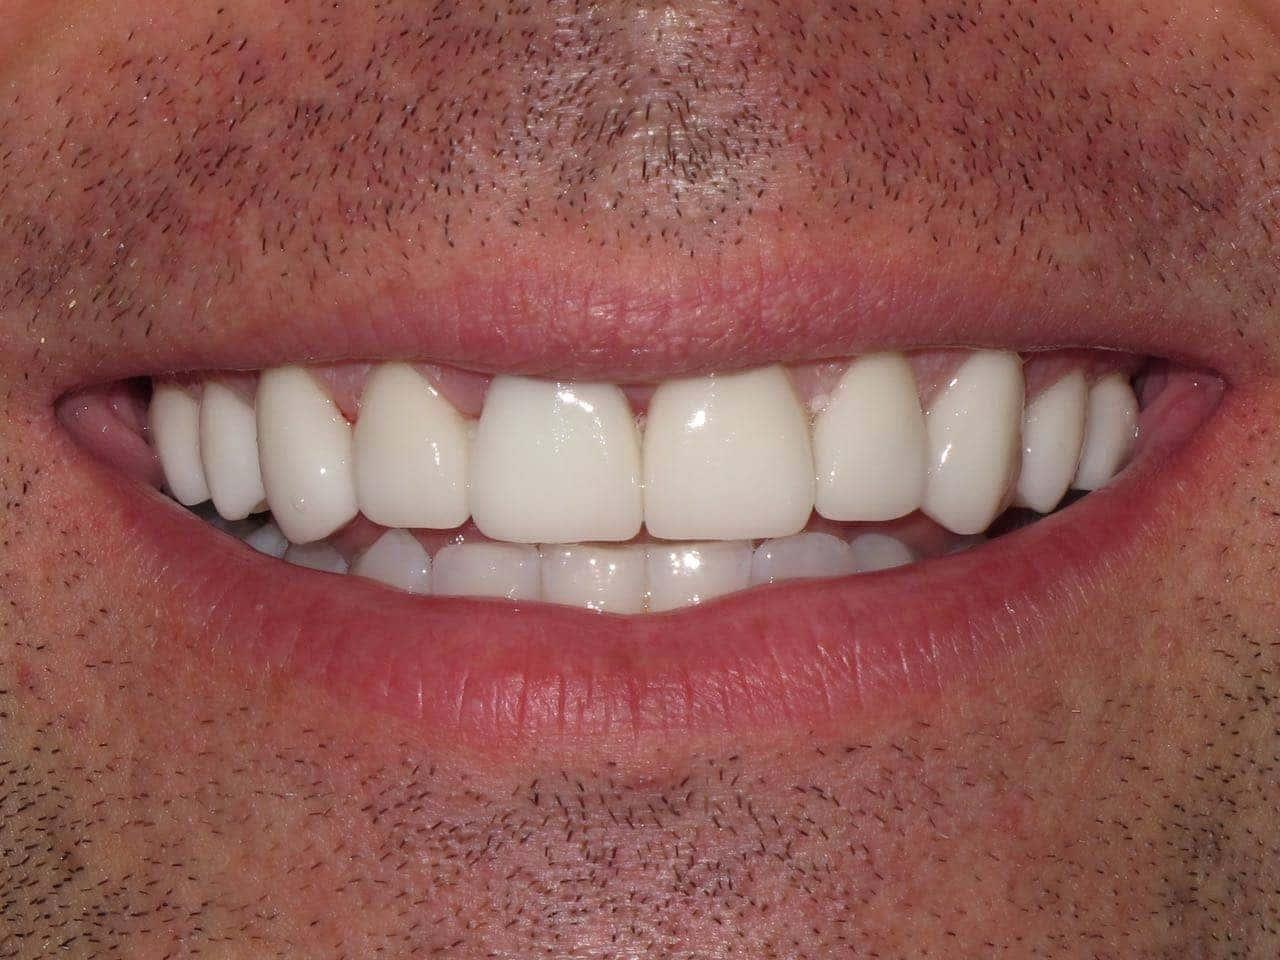 Photos shaved teeth for porceline veneers share